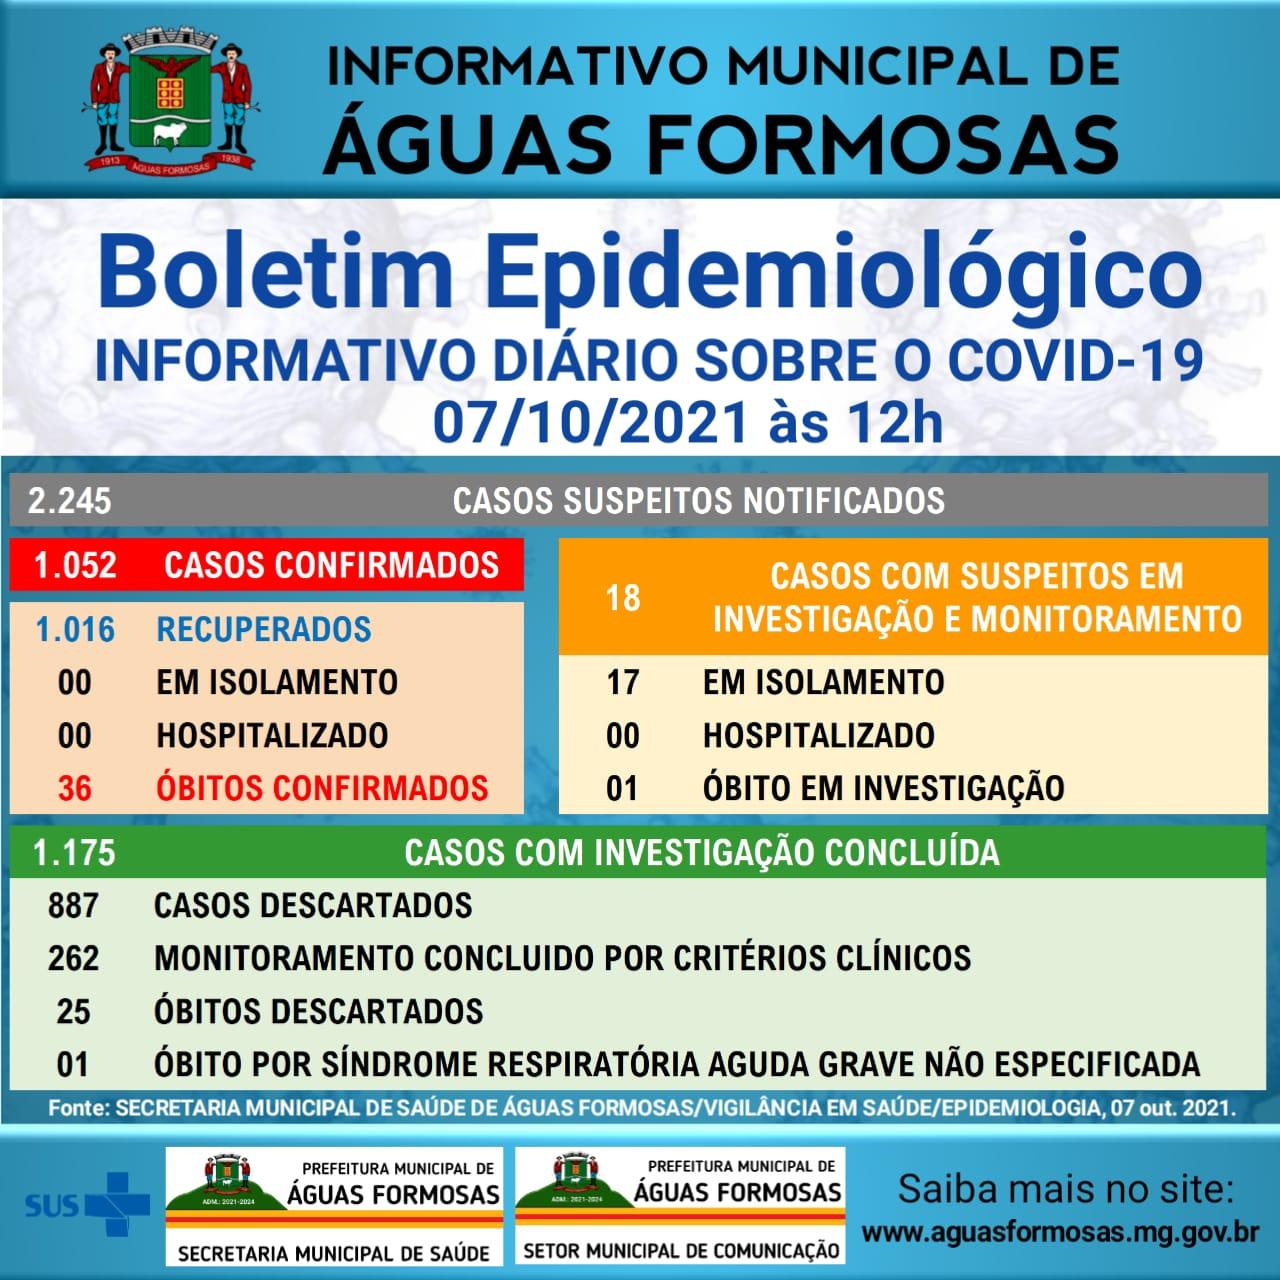 BOLETIM EPIDEMIOLÓGICO CORONAVÍRUS - 07/10/2021